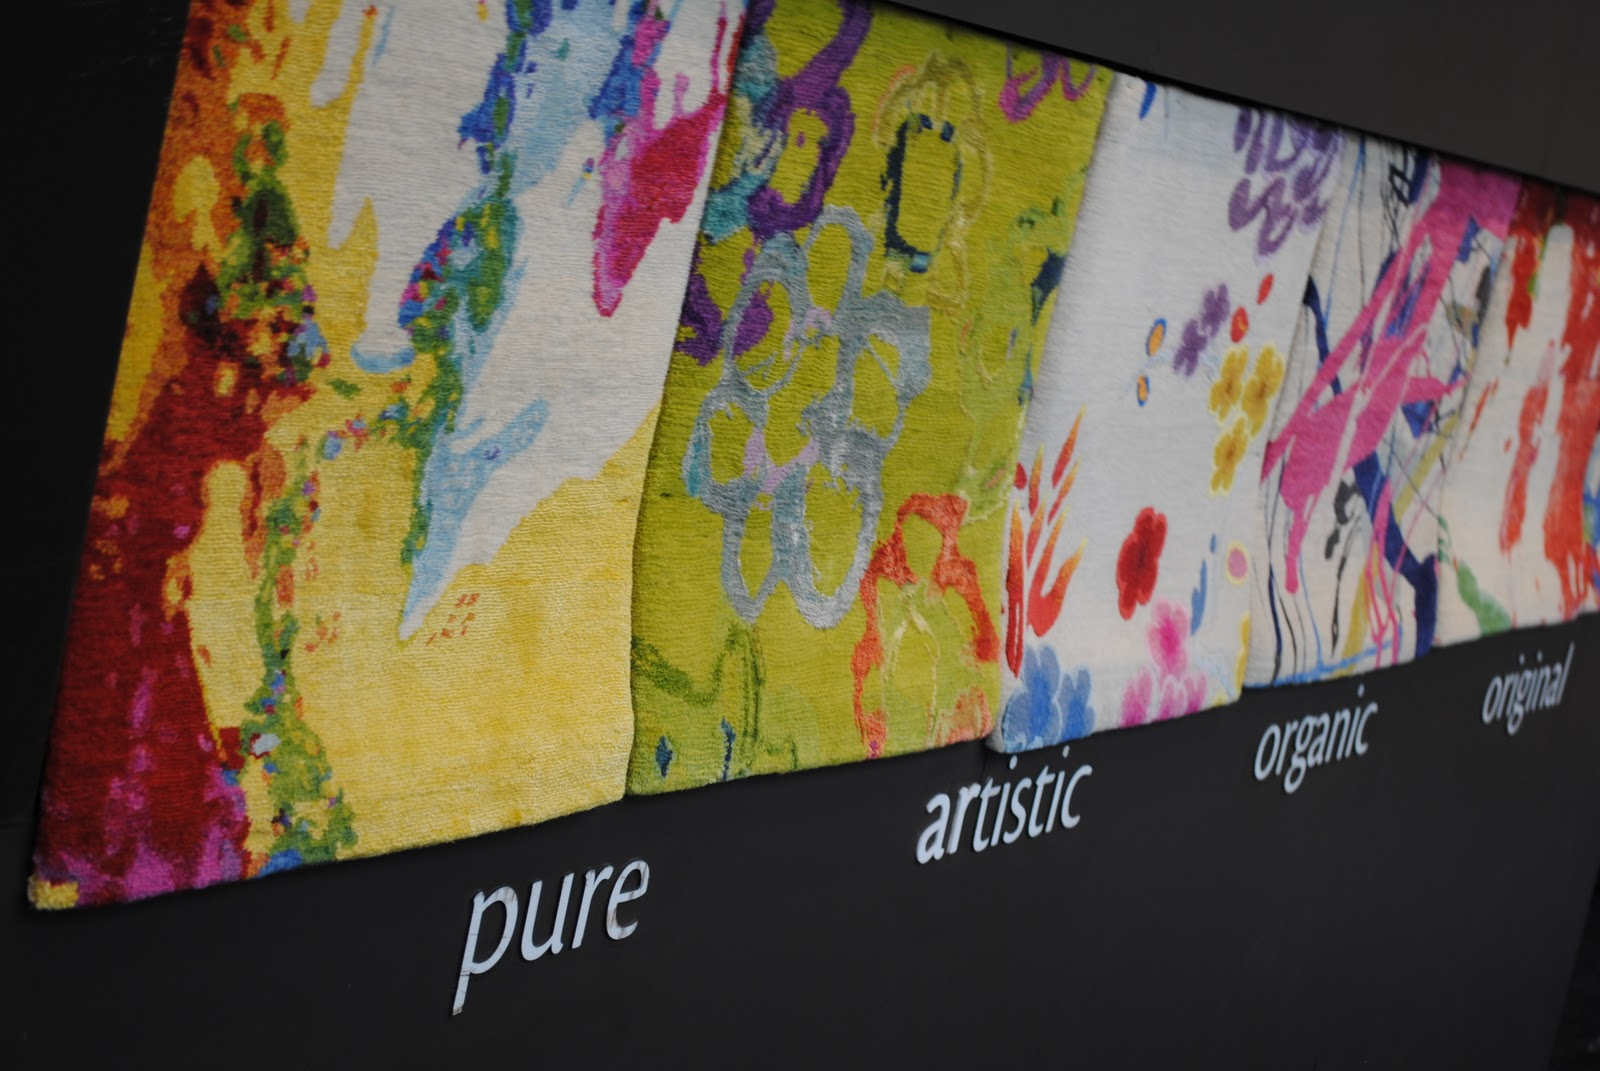 http://3.bp.blogspot.com/_4kErUg2g8lo/TUMoprjgUyI/AAAAAAAAEhM/0kA5_Jl4FHM/s1600/design+show+2011+108.JPG